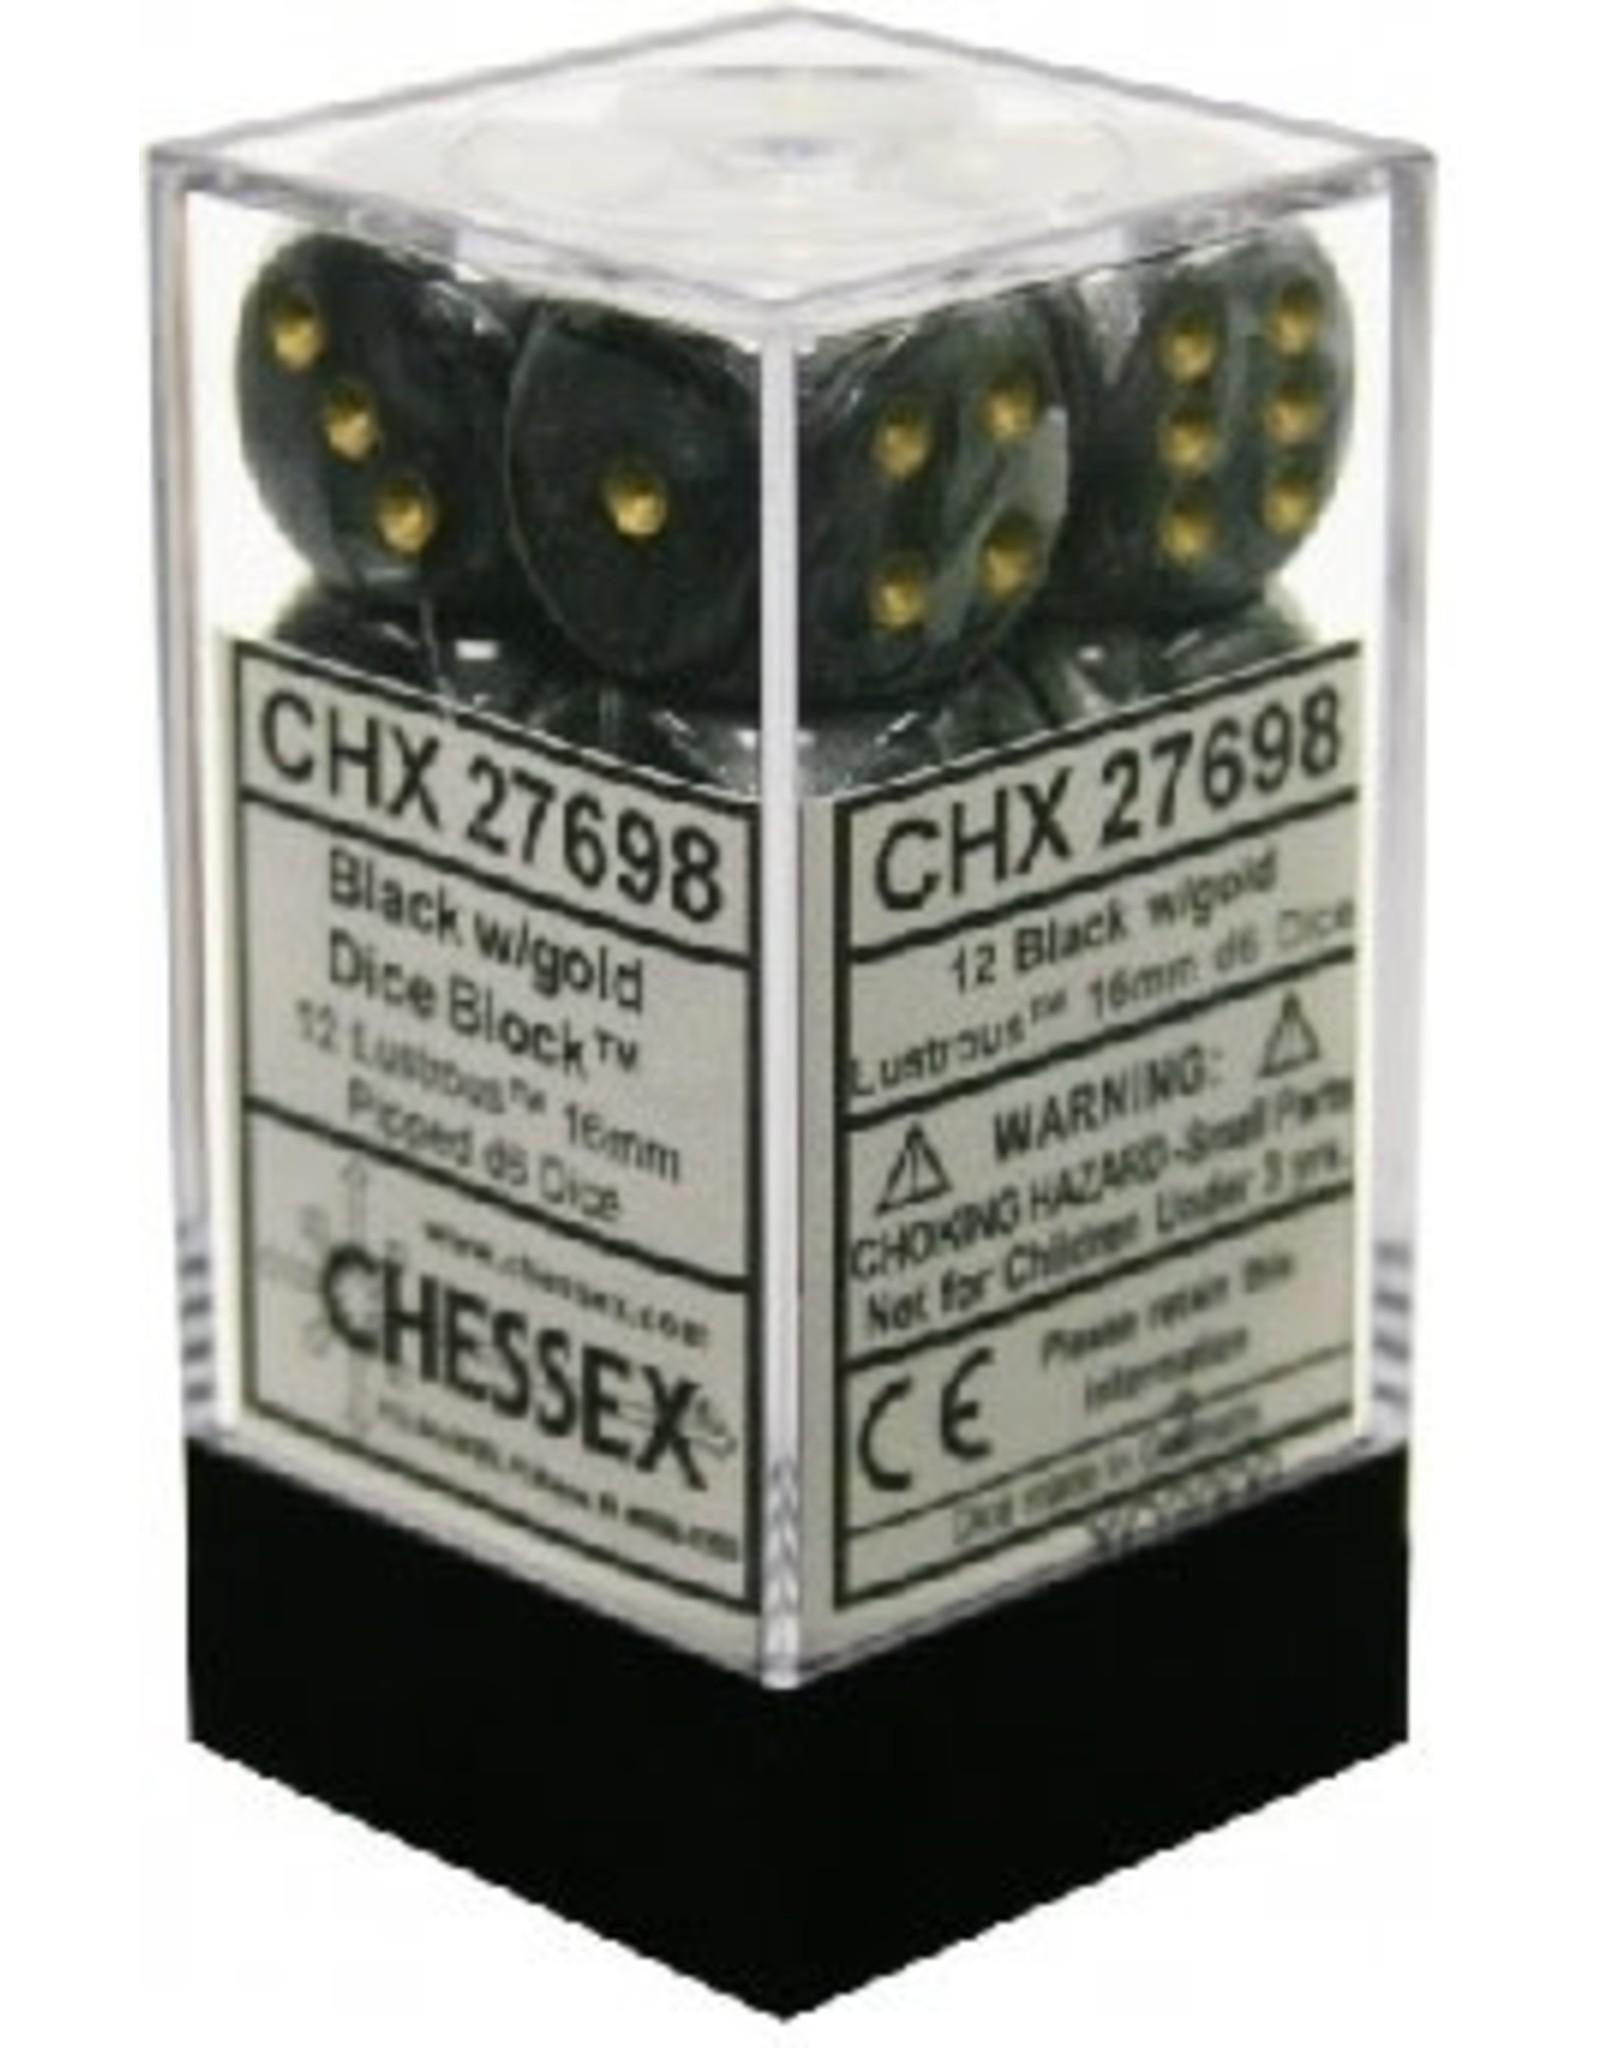 CHESSEX LUSTROUS 12D6 BLACK/GOLD 16MM